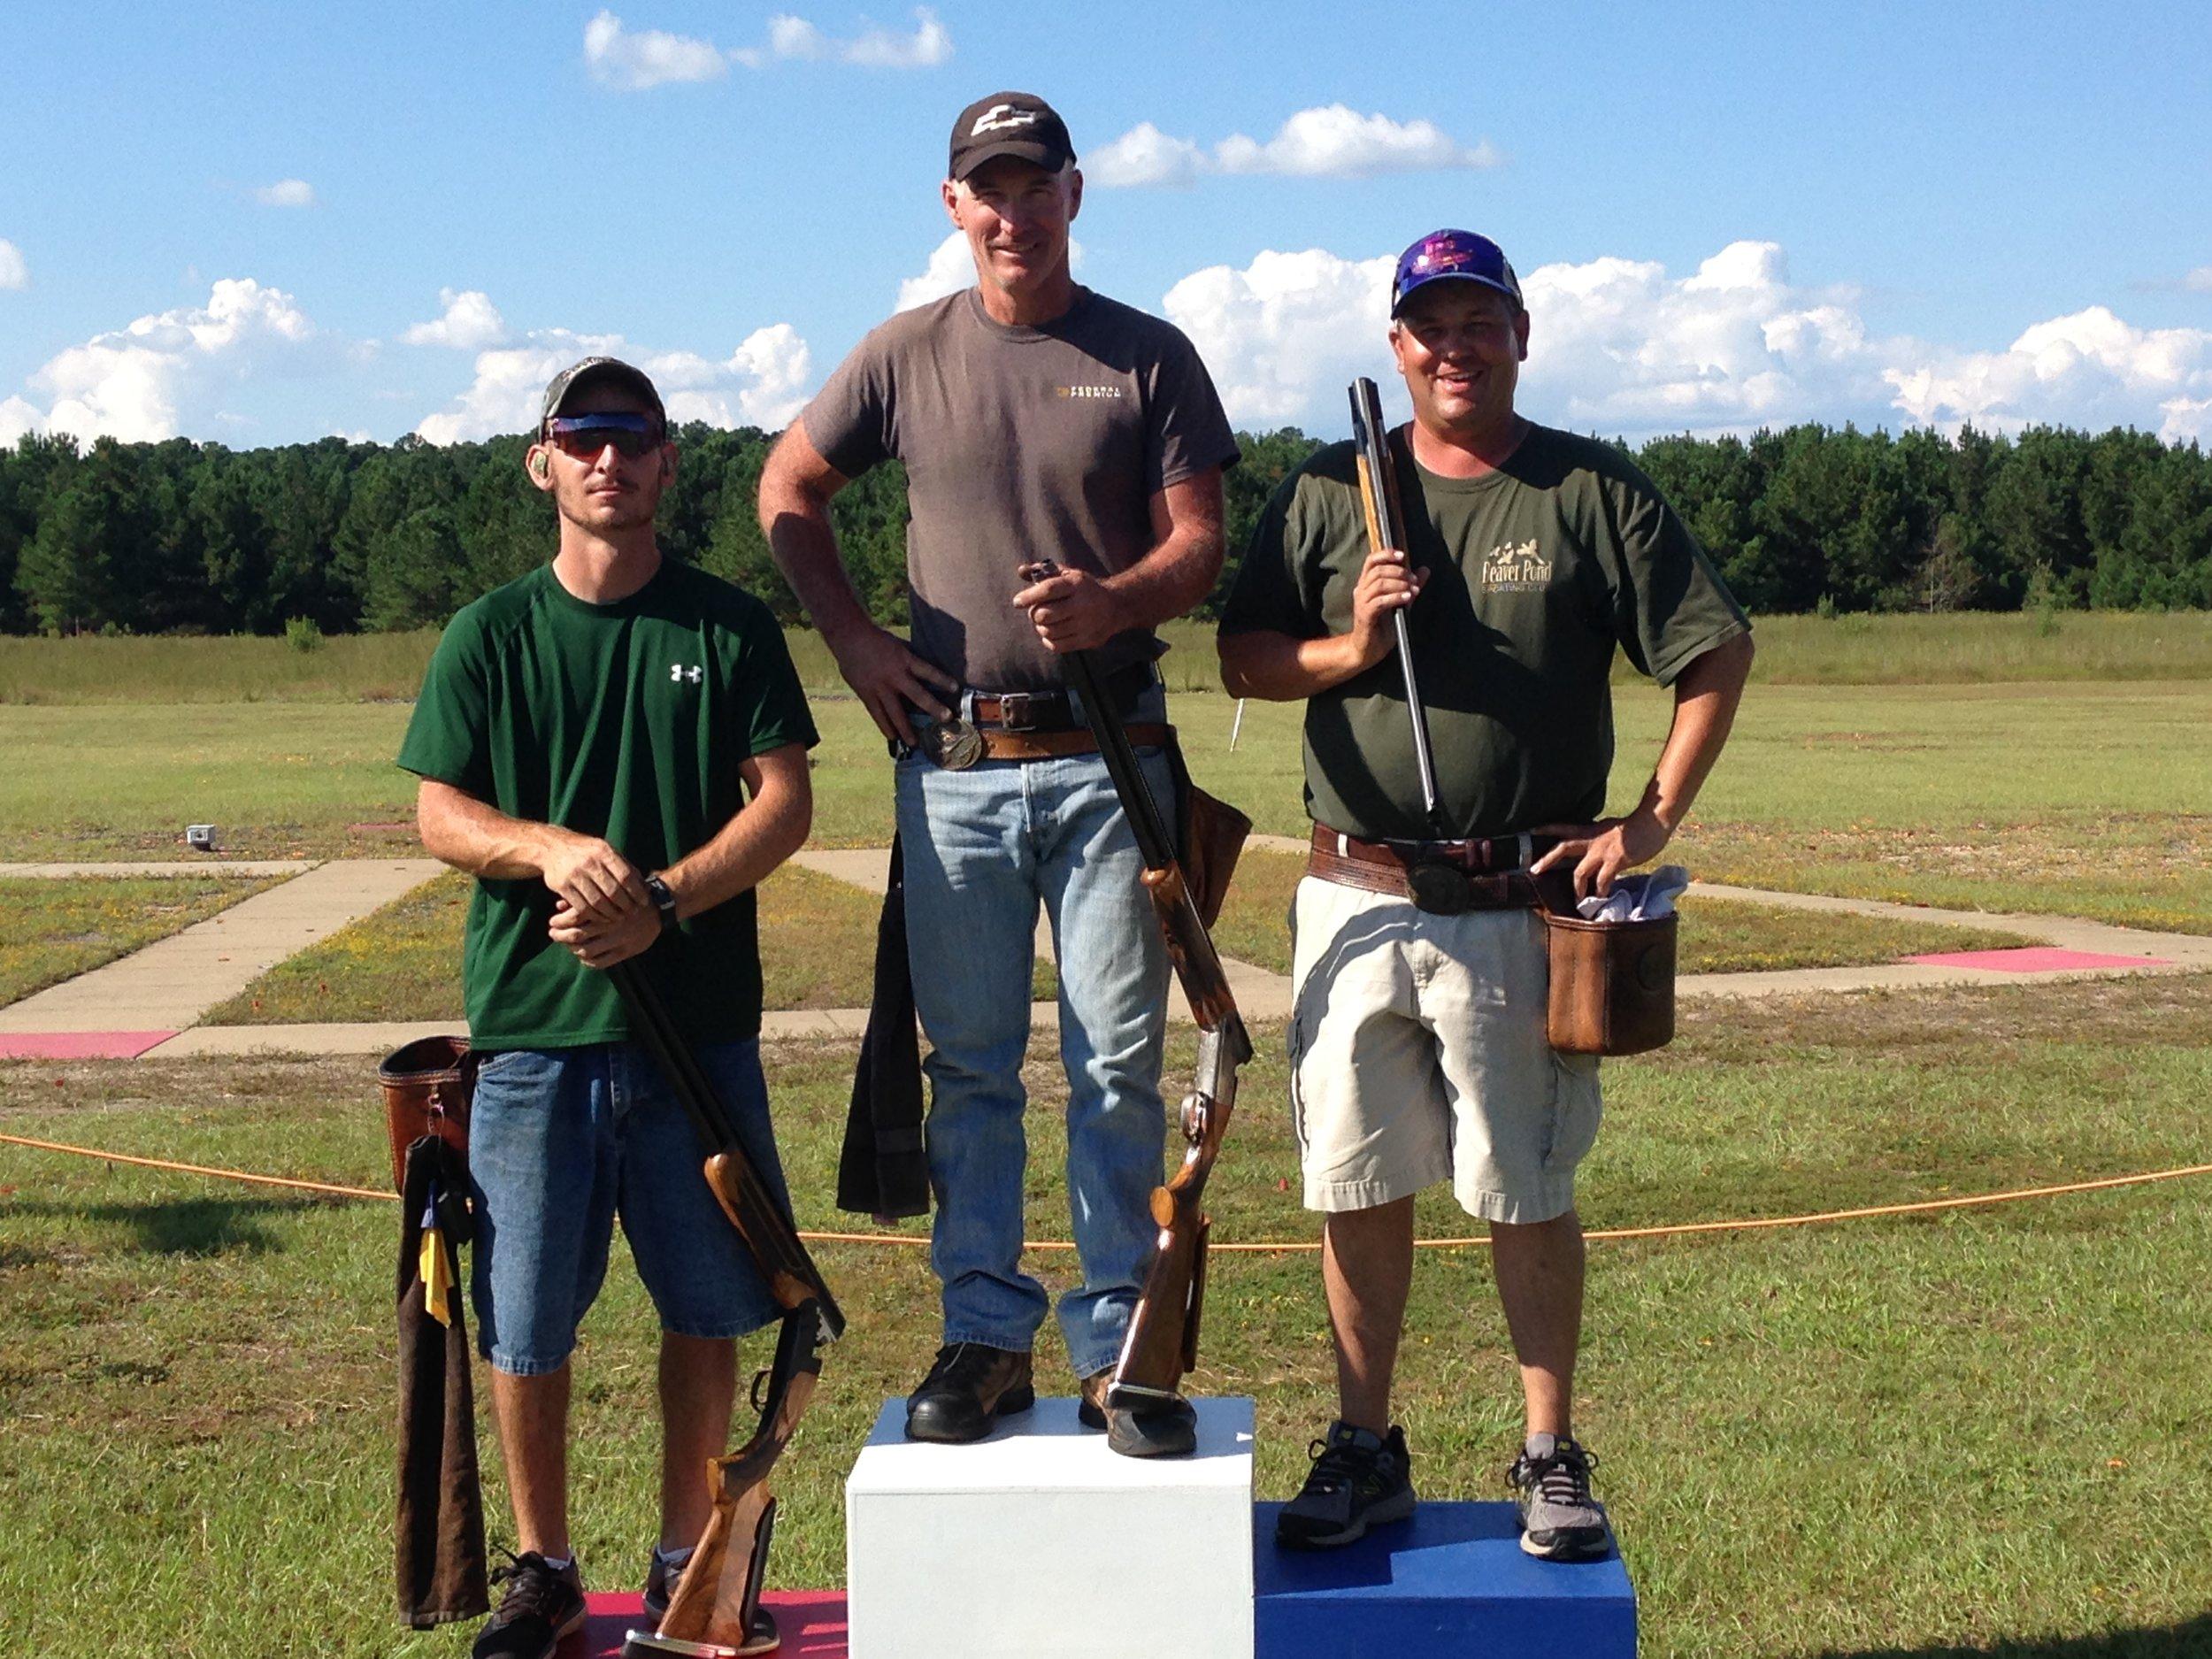 .410 winners: Champion - Stuart Brown (99), Runner-up - Craig Kirkman (98), and 3rd - Kevin Hostinsky (98).